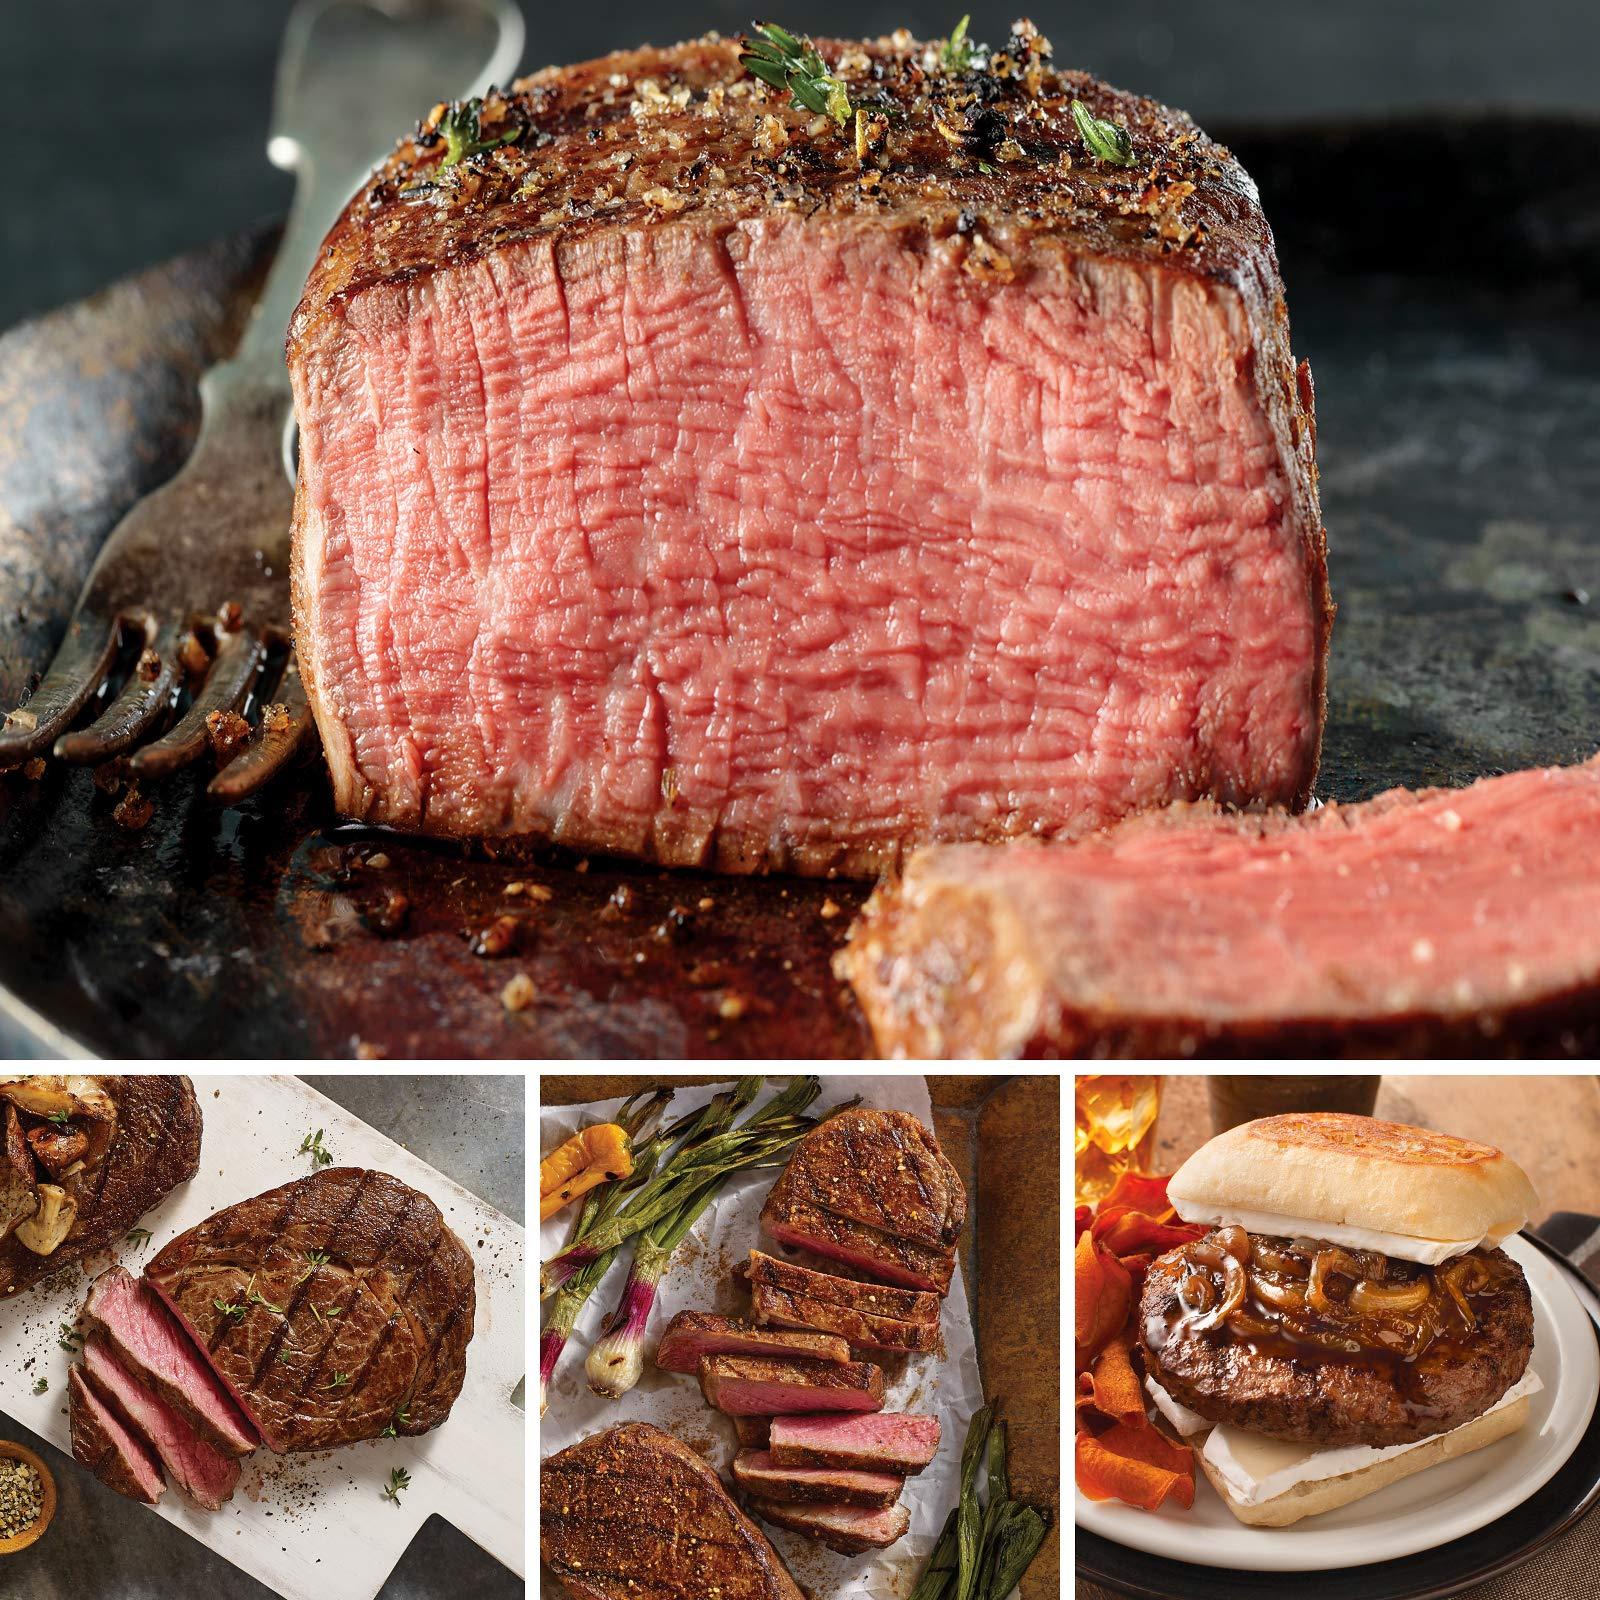 Omaha Steaks Santa's Steak Combo (10-Piece with Filet Mignons, Ribeyes, Boneless New York Strips, and Steak Burgers)